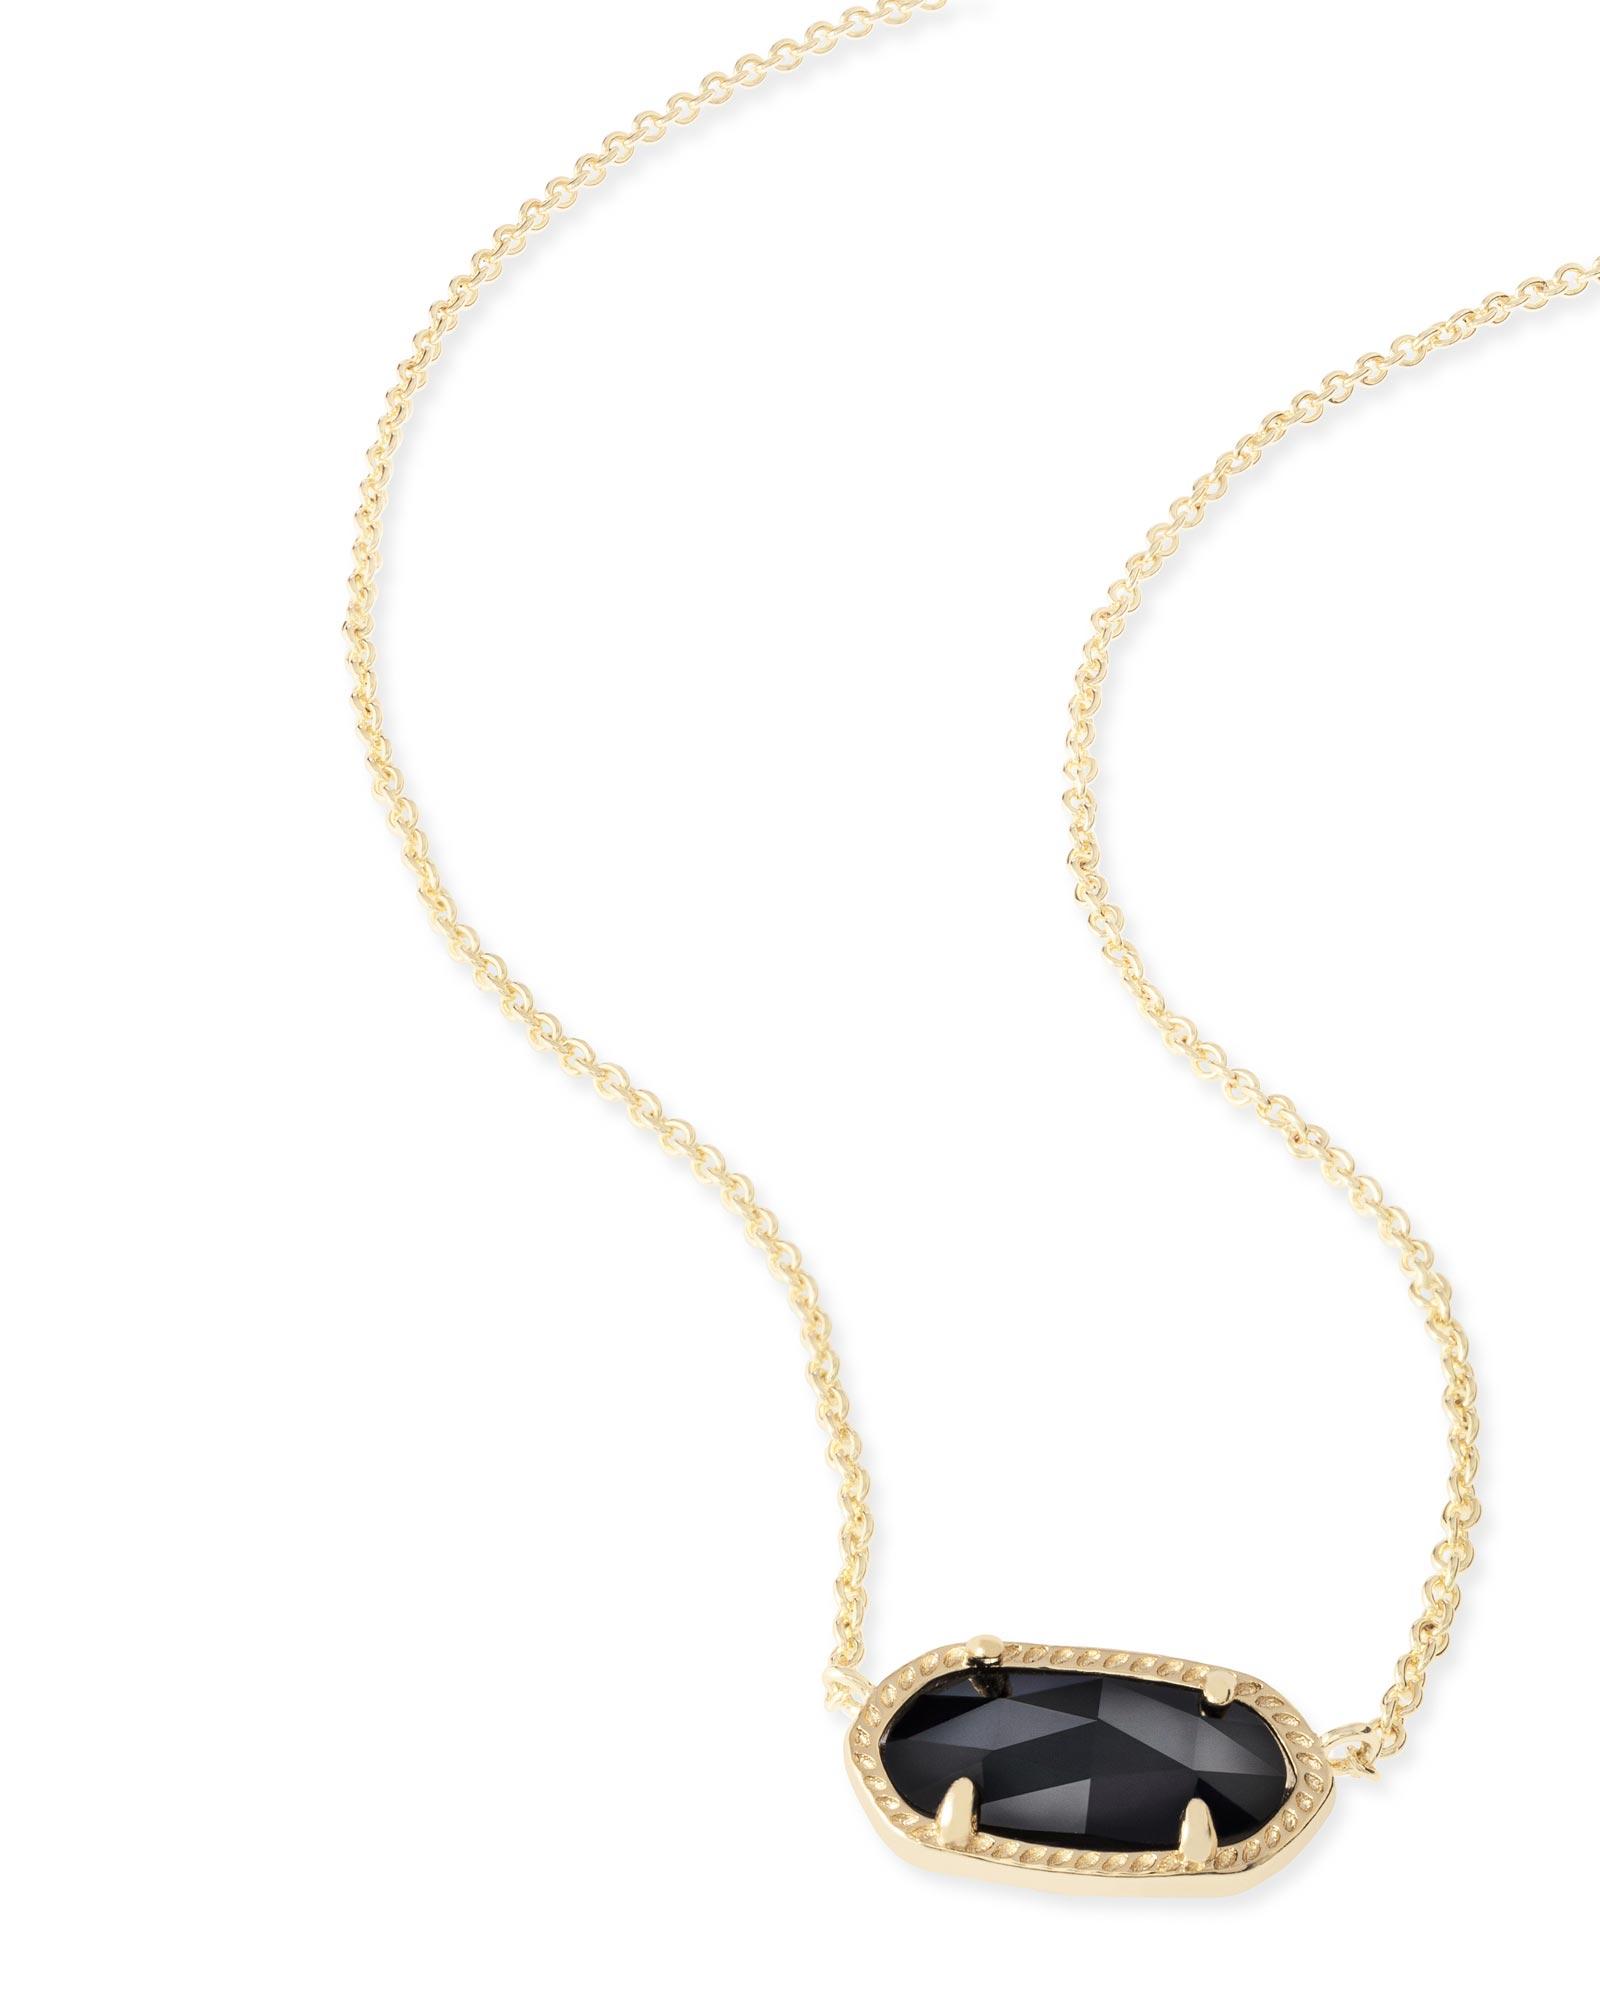 Elisa Gold Pendant Necklace in Black   Kendra Scott